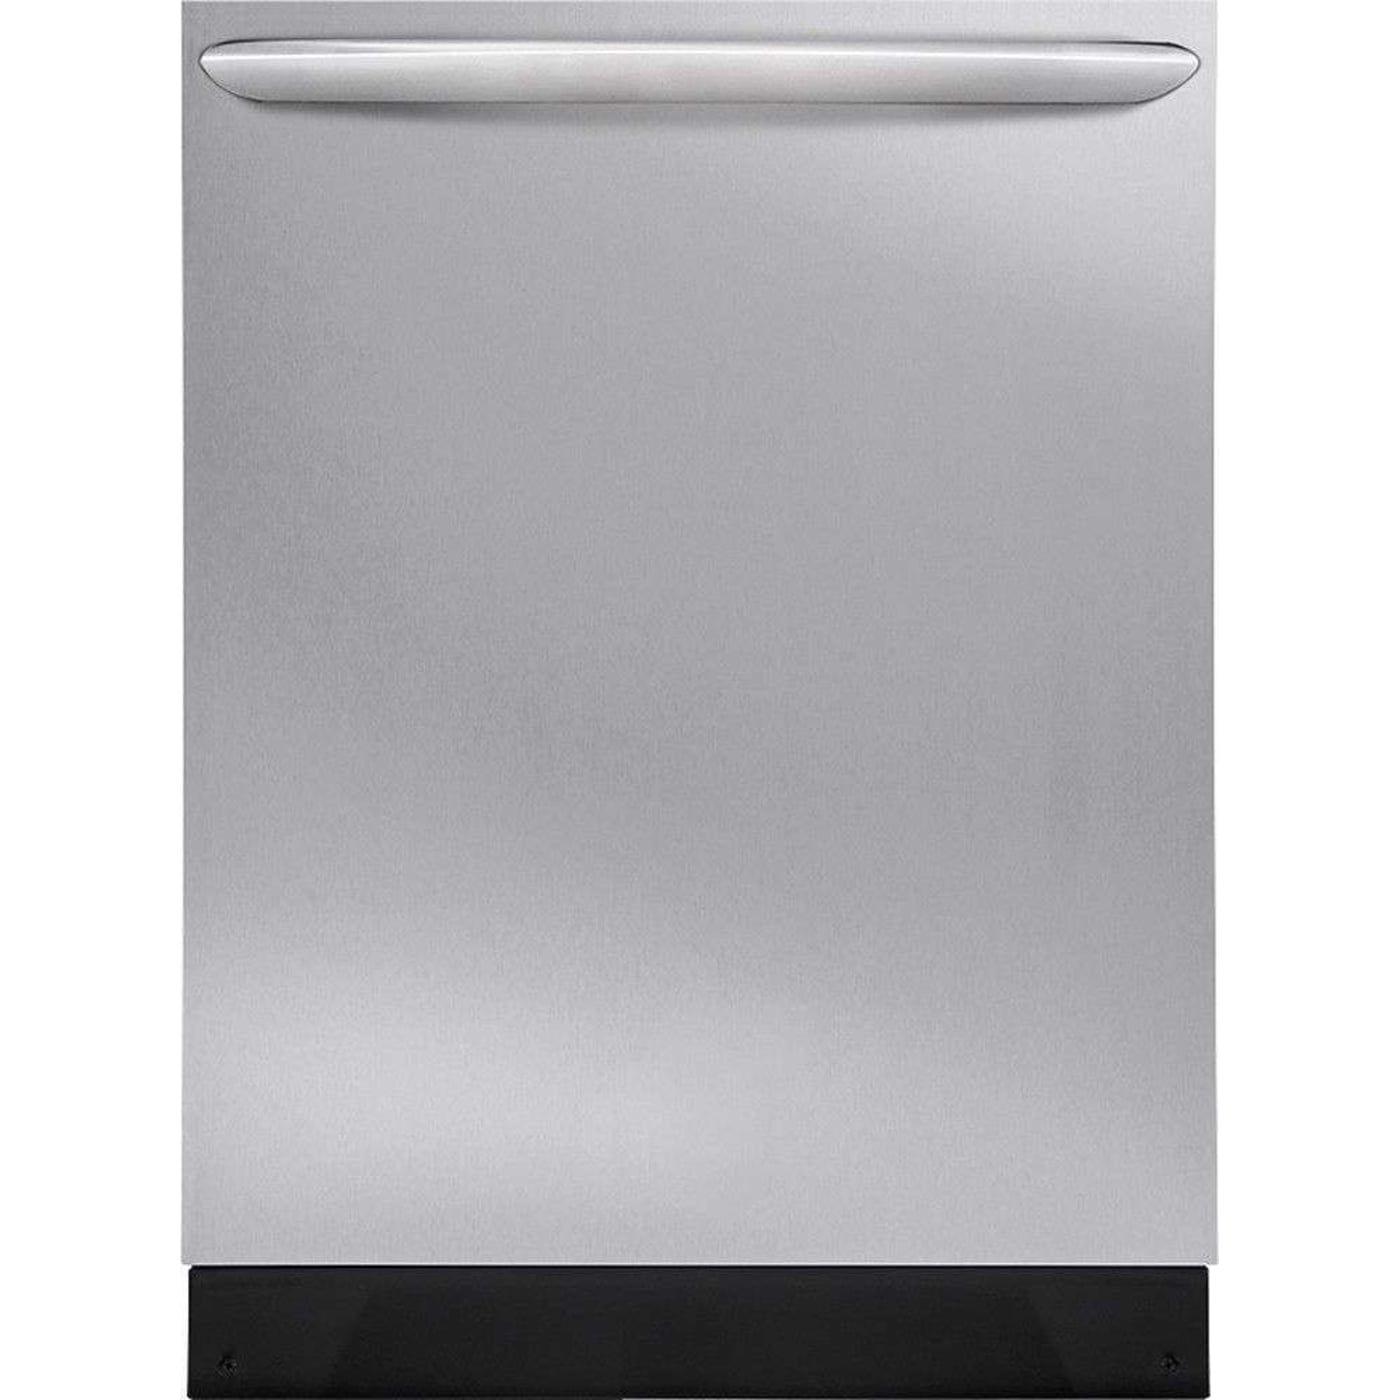 Fgid2466qf By Frigidaire Fully Integrated Dishwashers